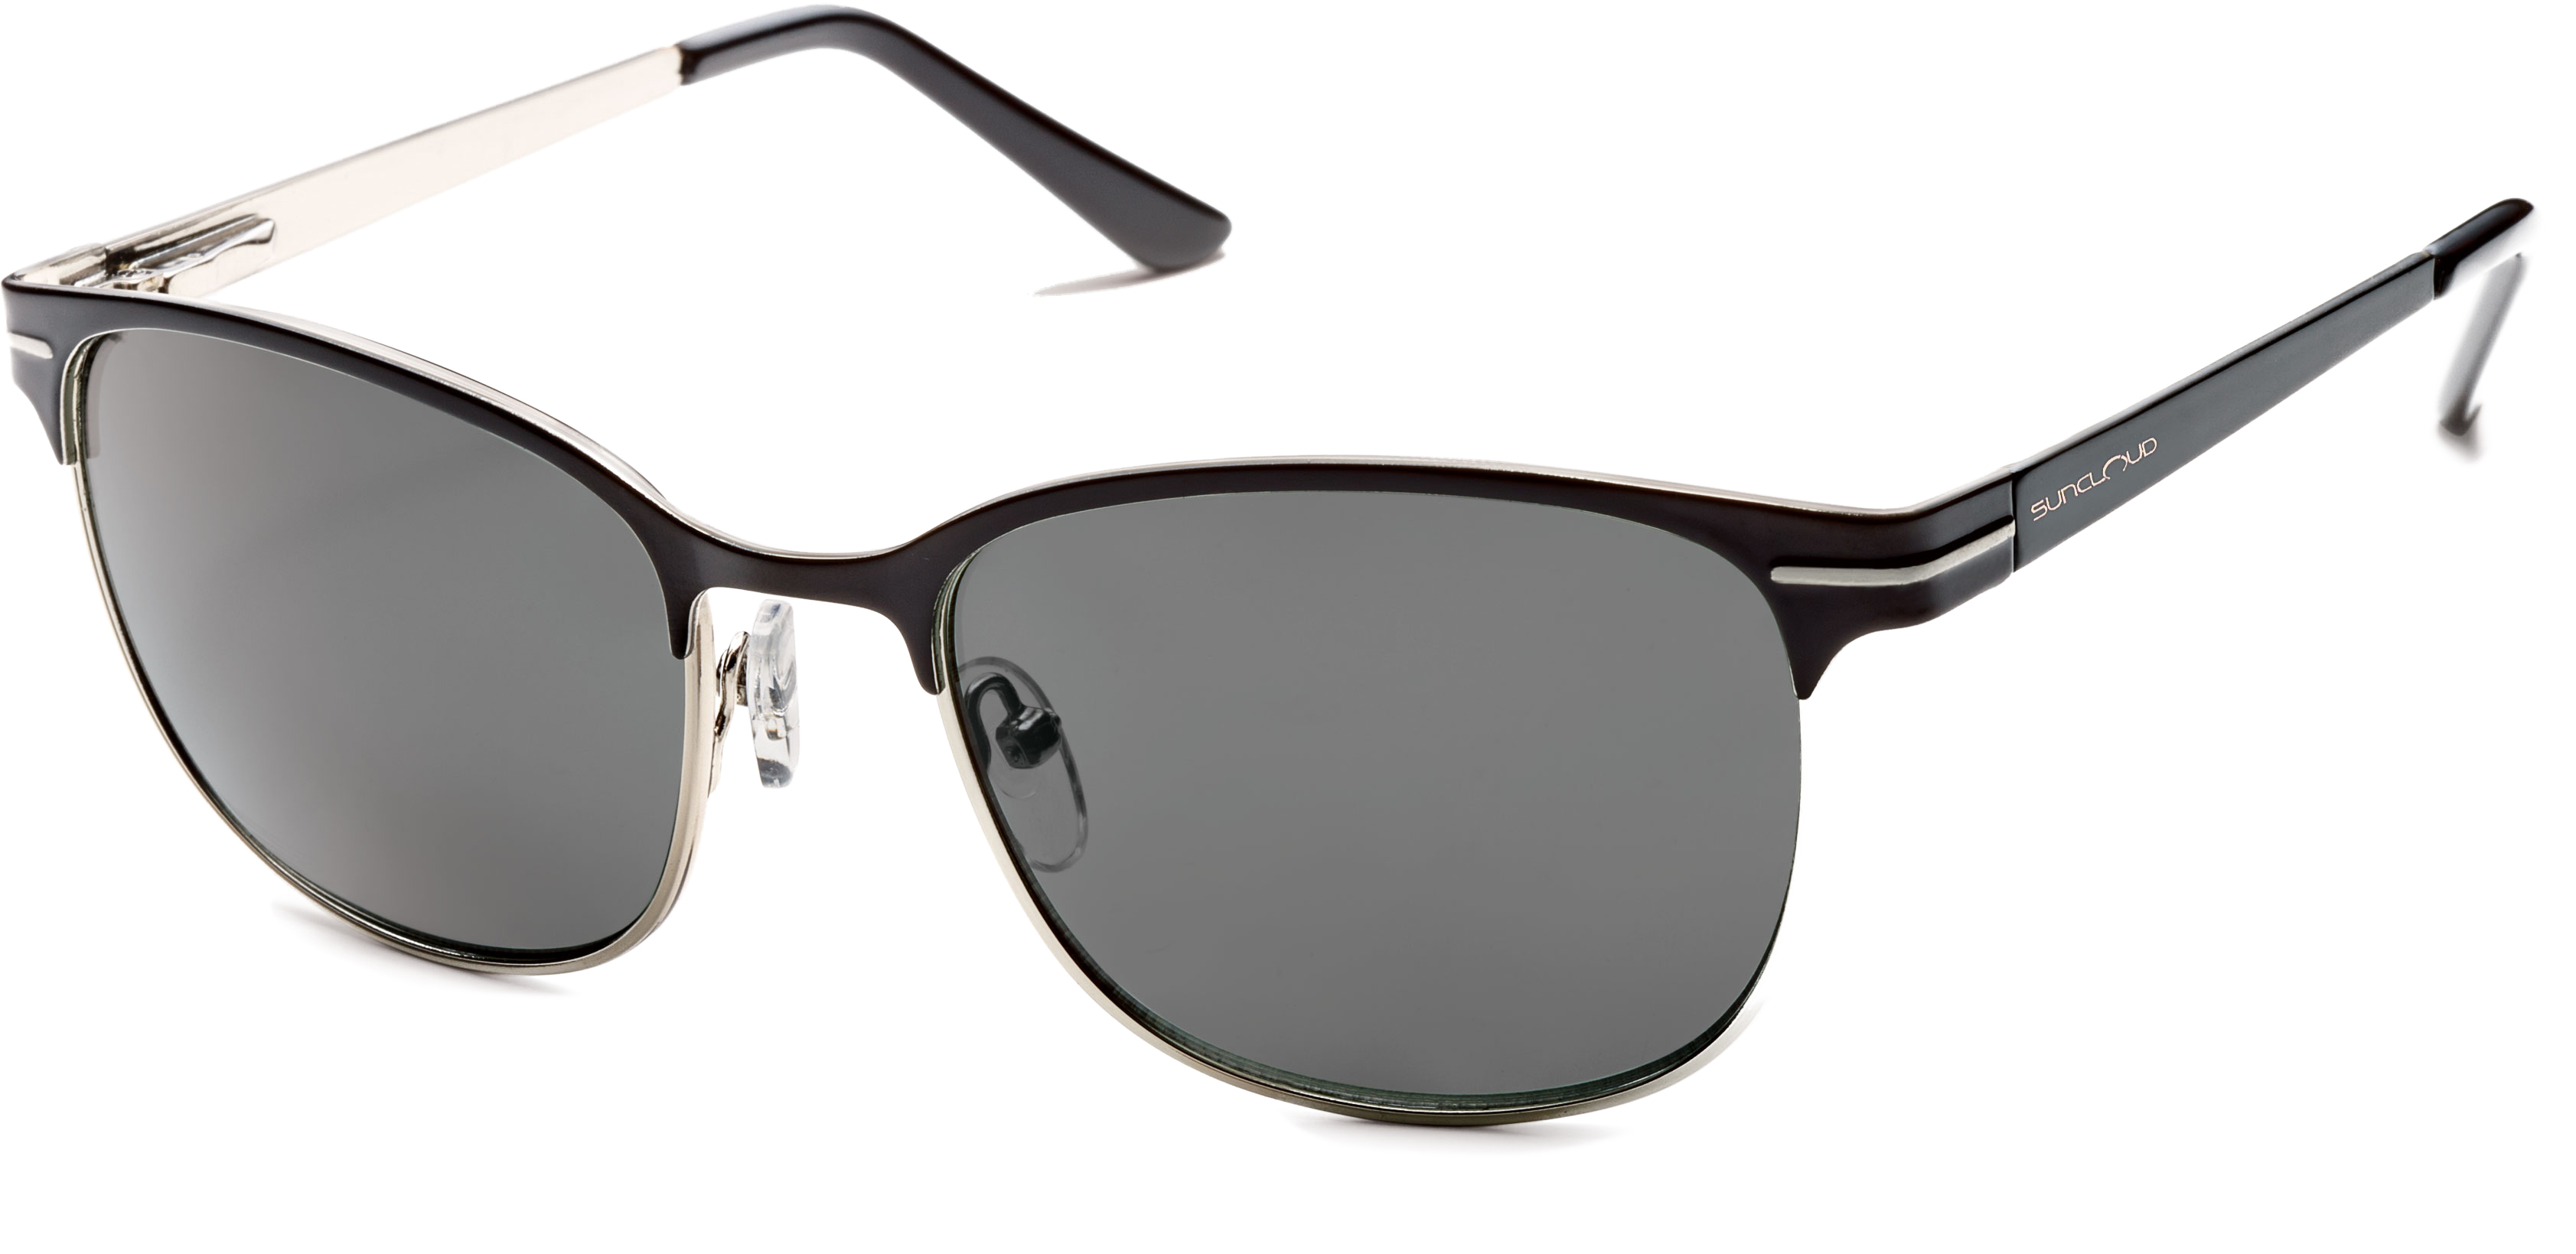 ac8cfe309a Suncloud Causeway Polarized Sunglasses - Unisex